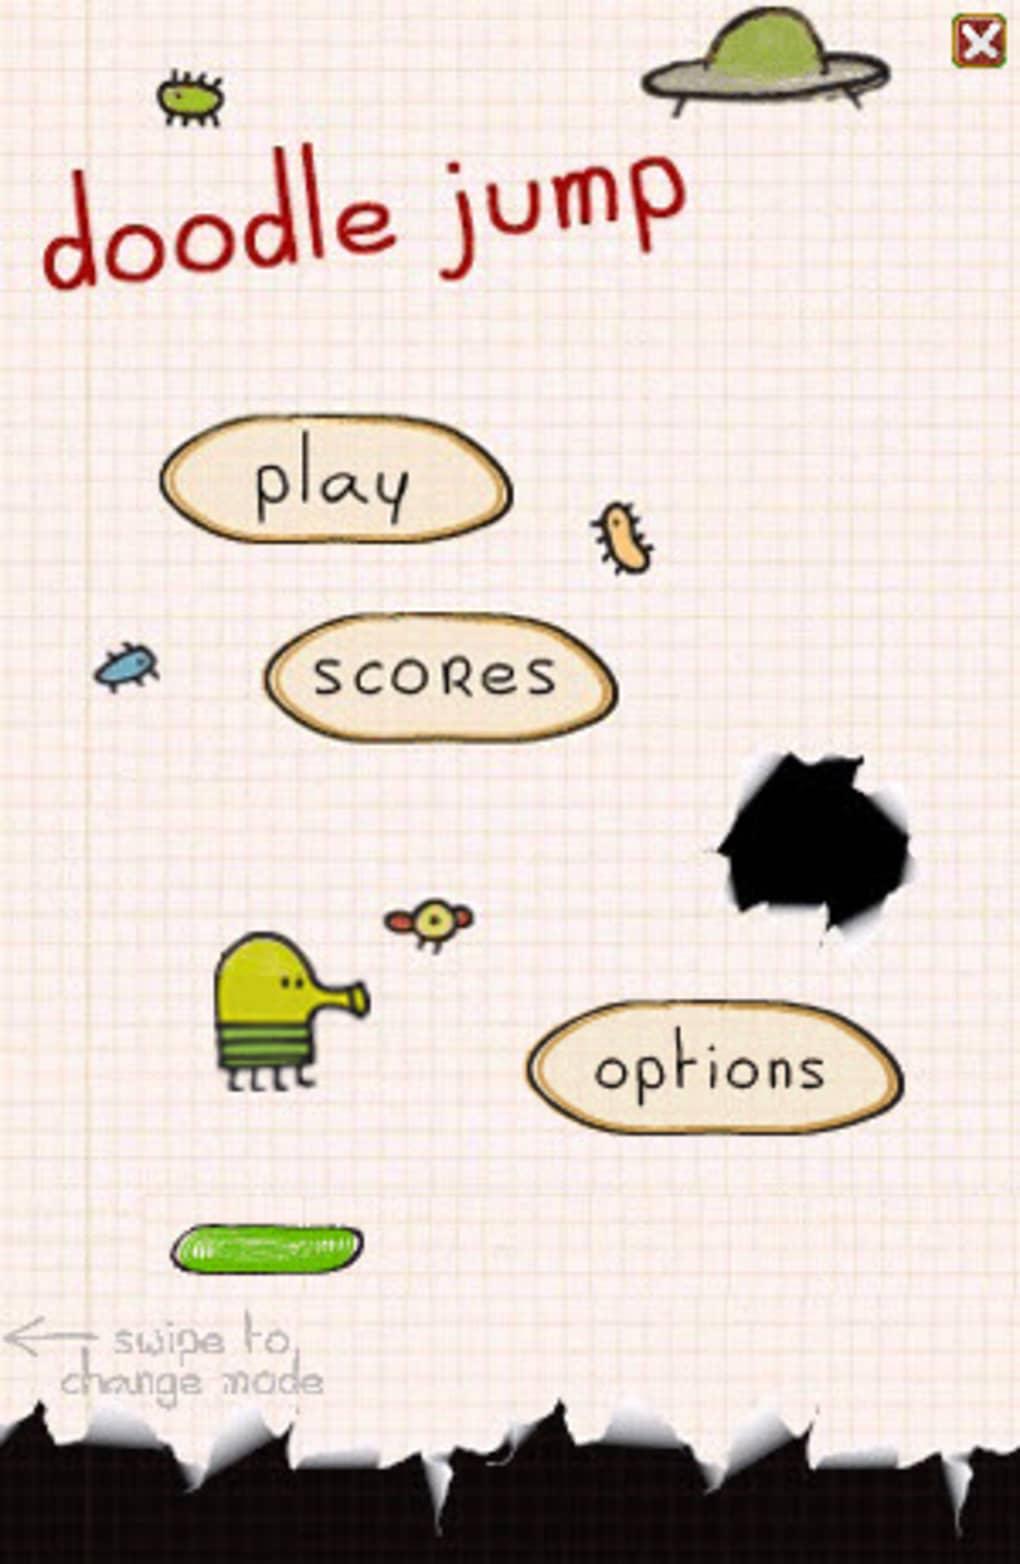 Doodle Jump - Download